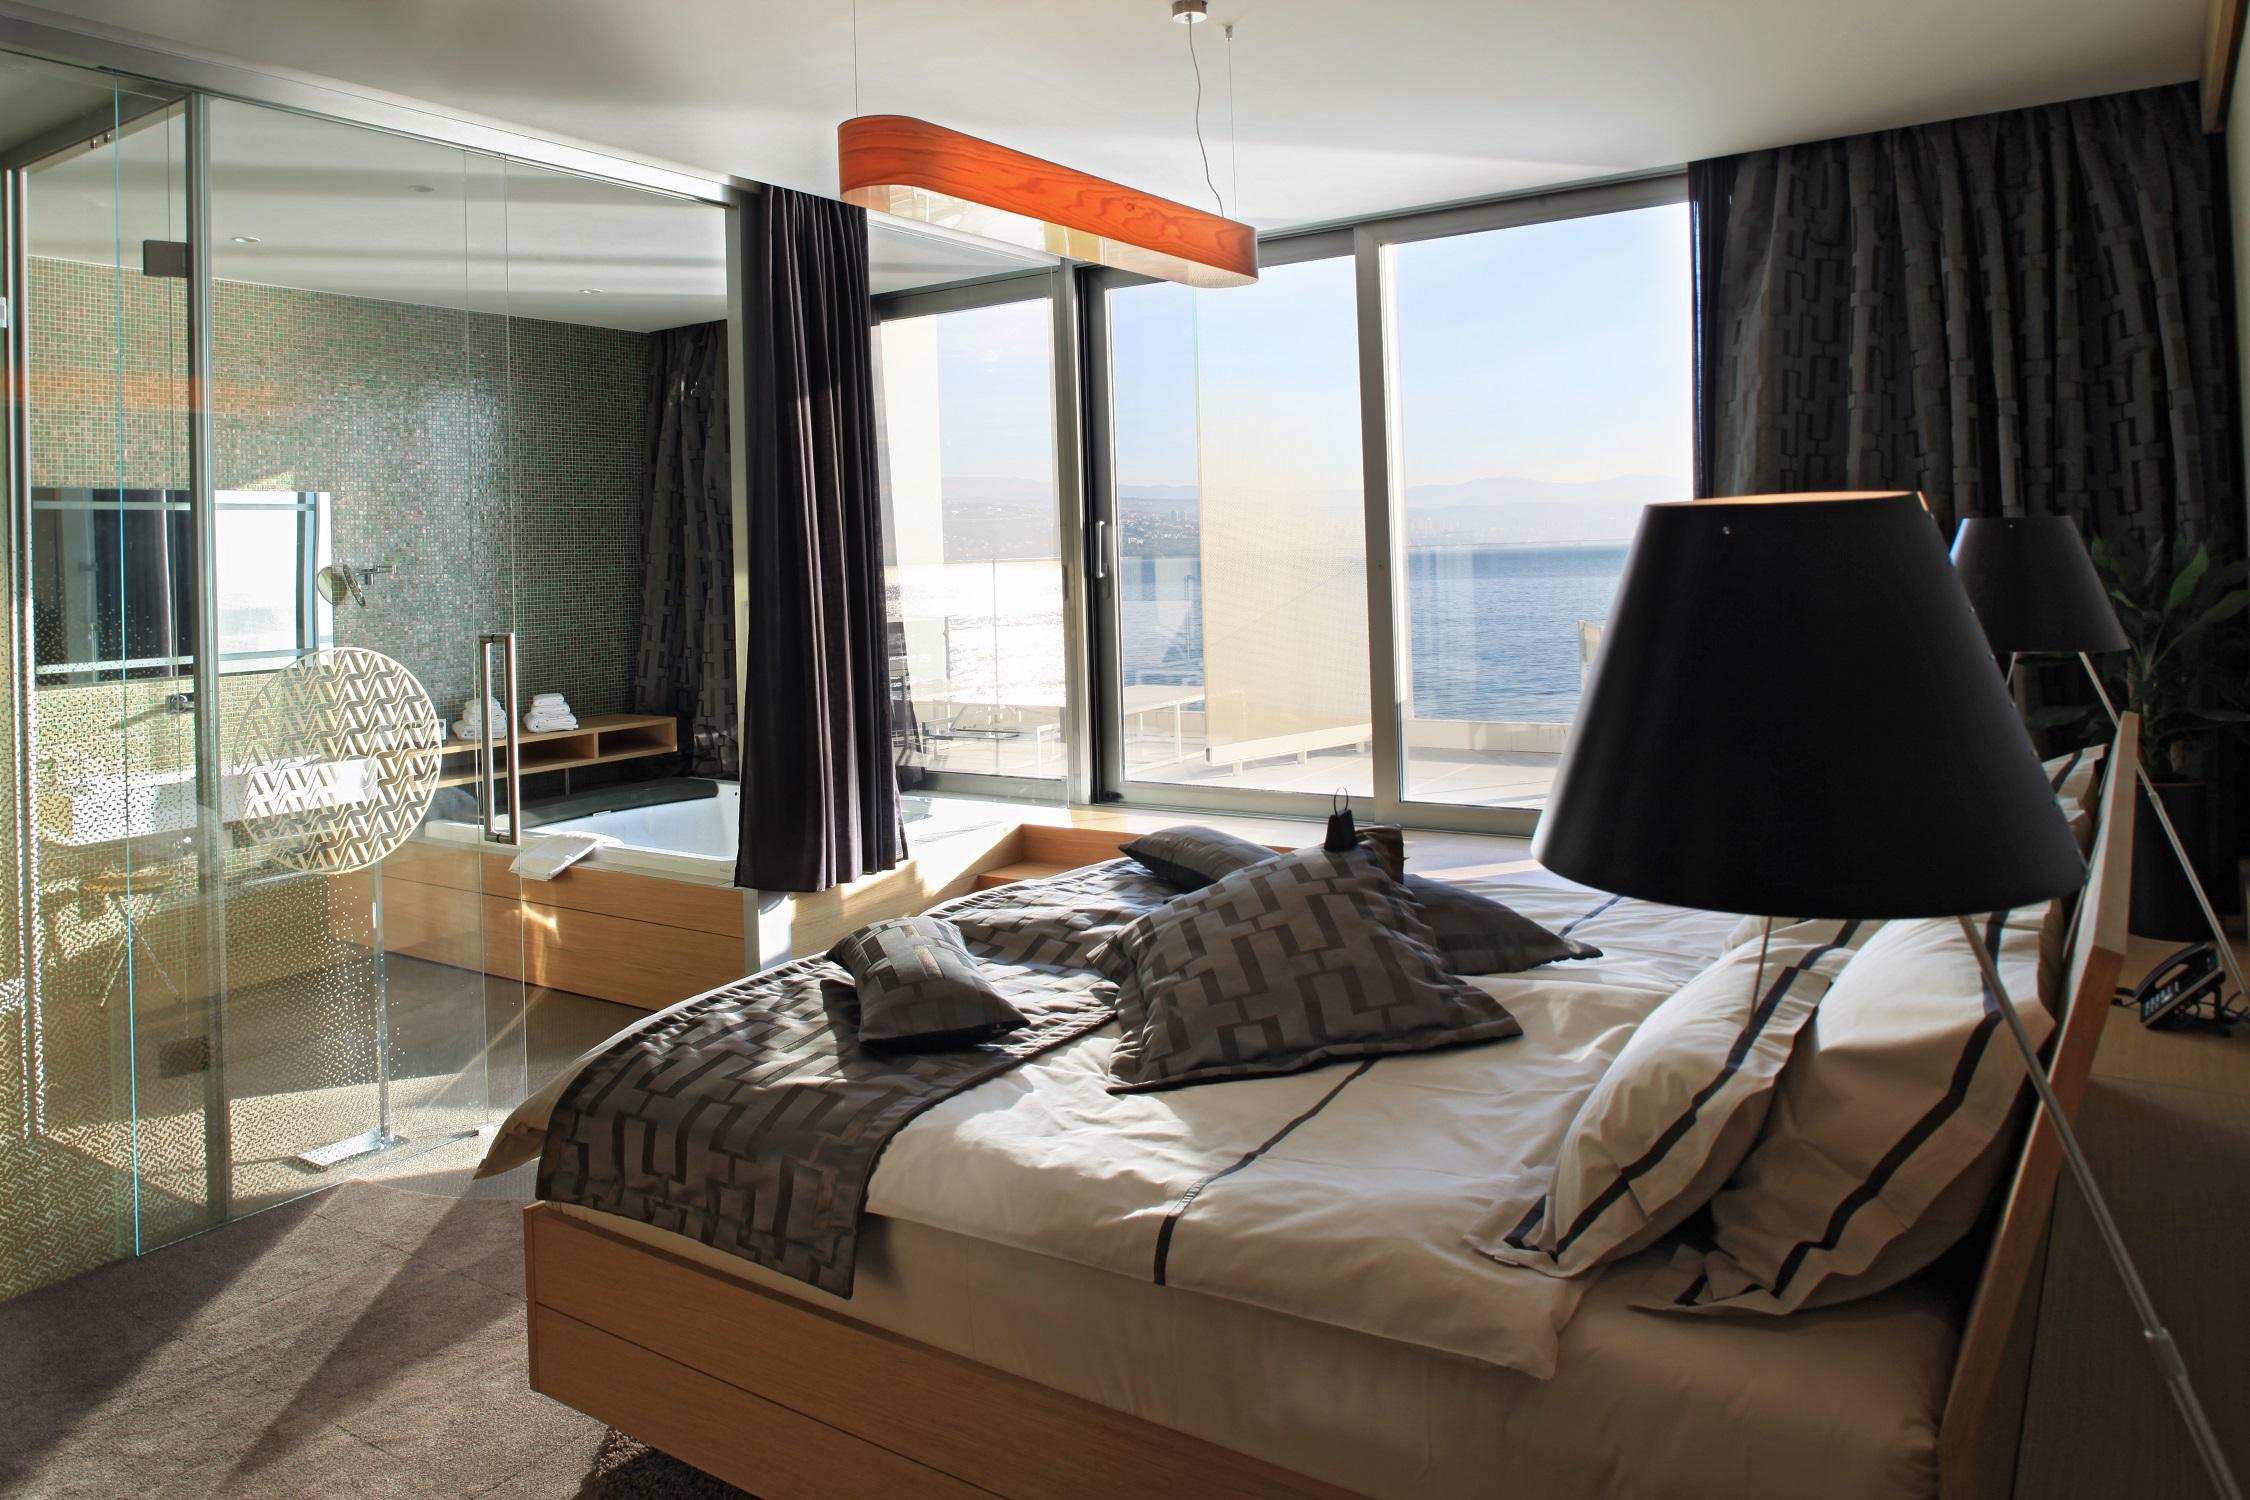 Booking bevanda 5 star design hotel restaurant bar for Design hotel opatija croatia